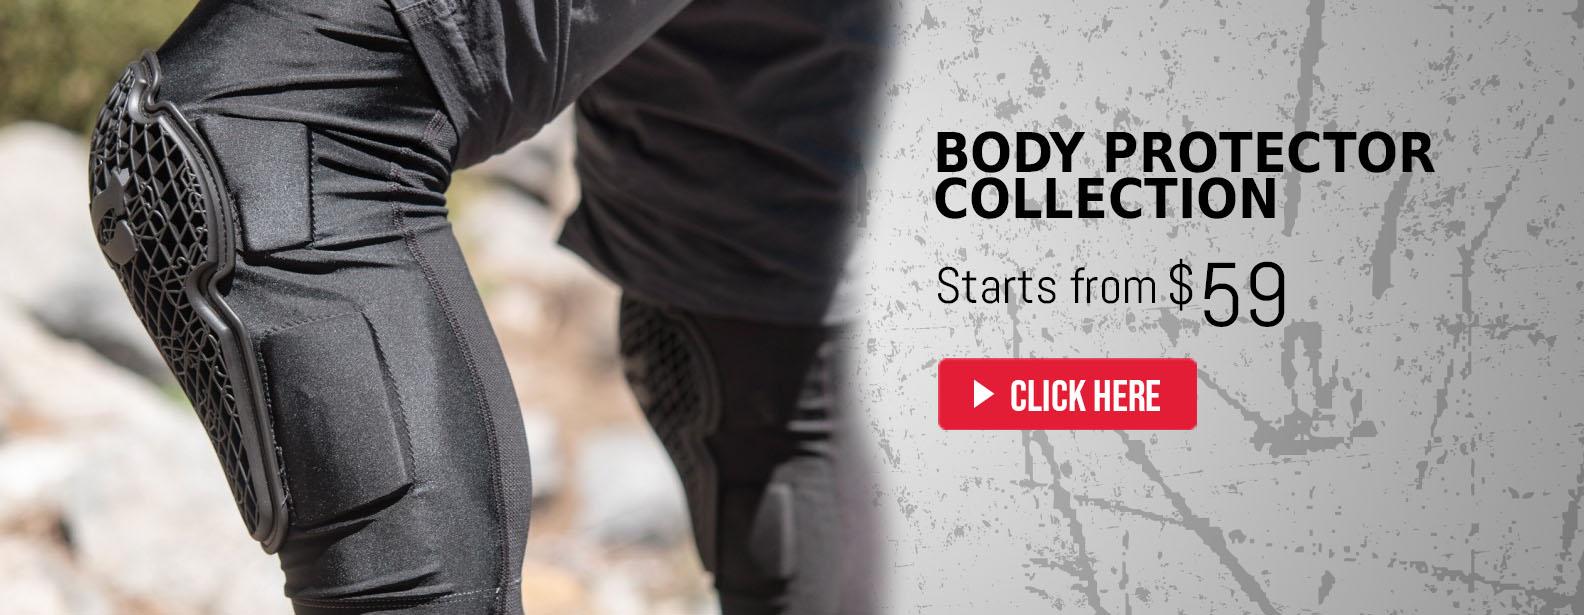 Buy Body Protector